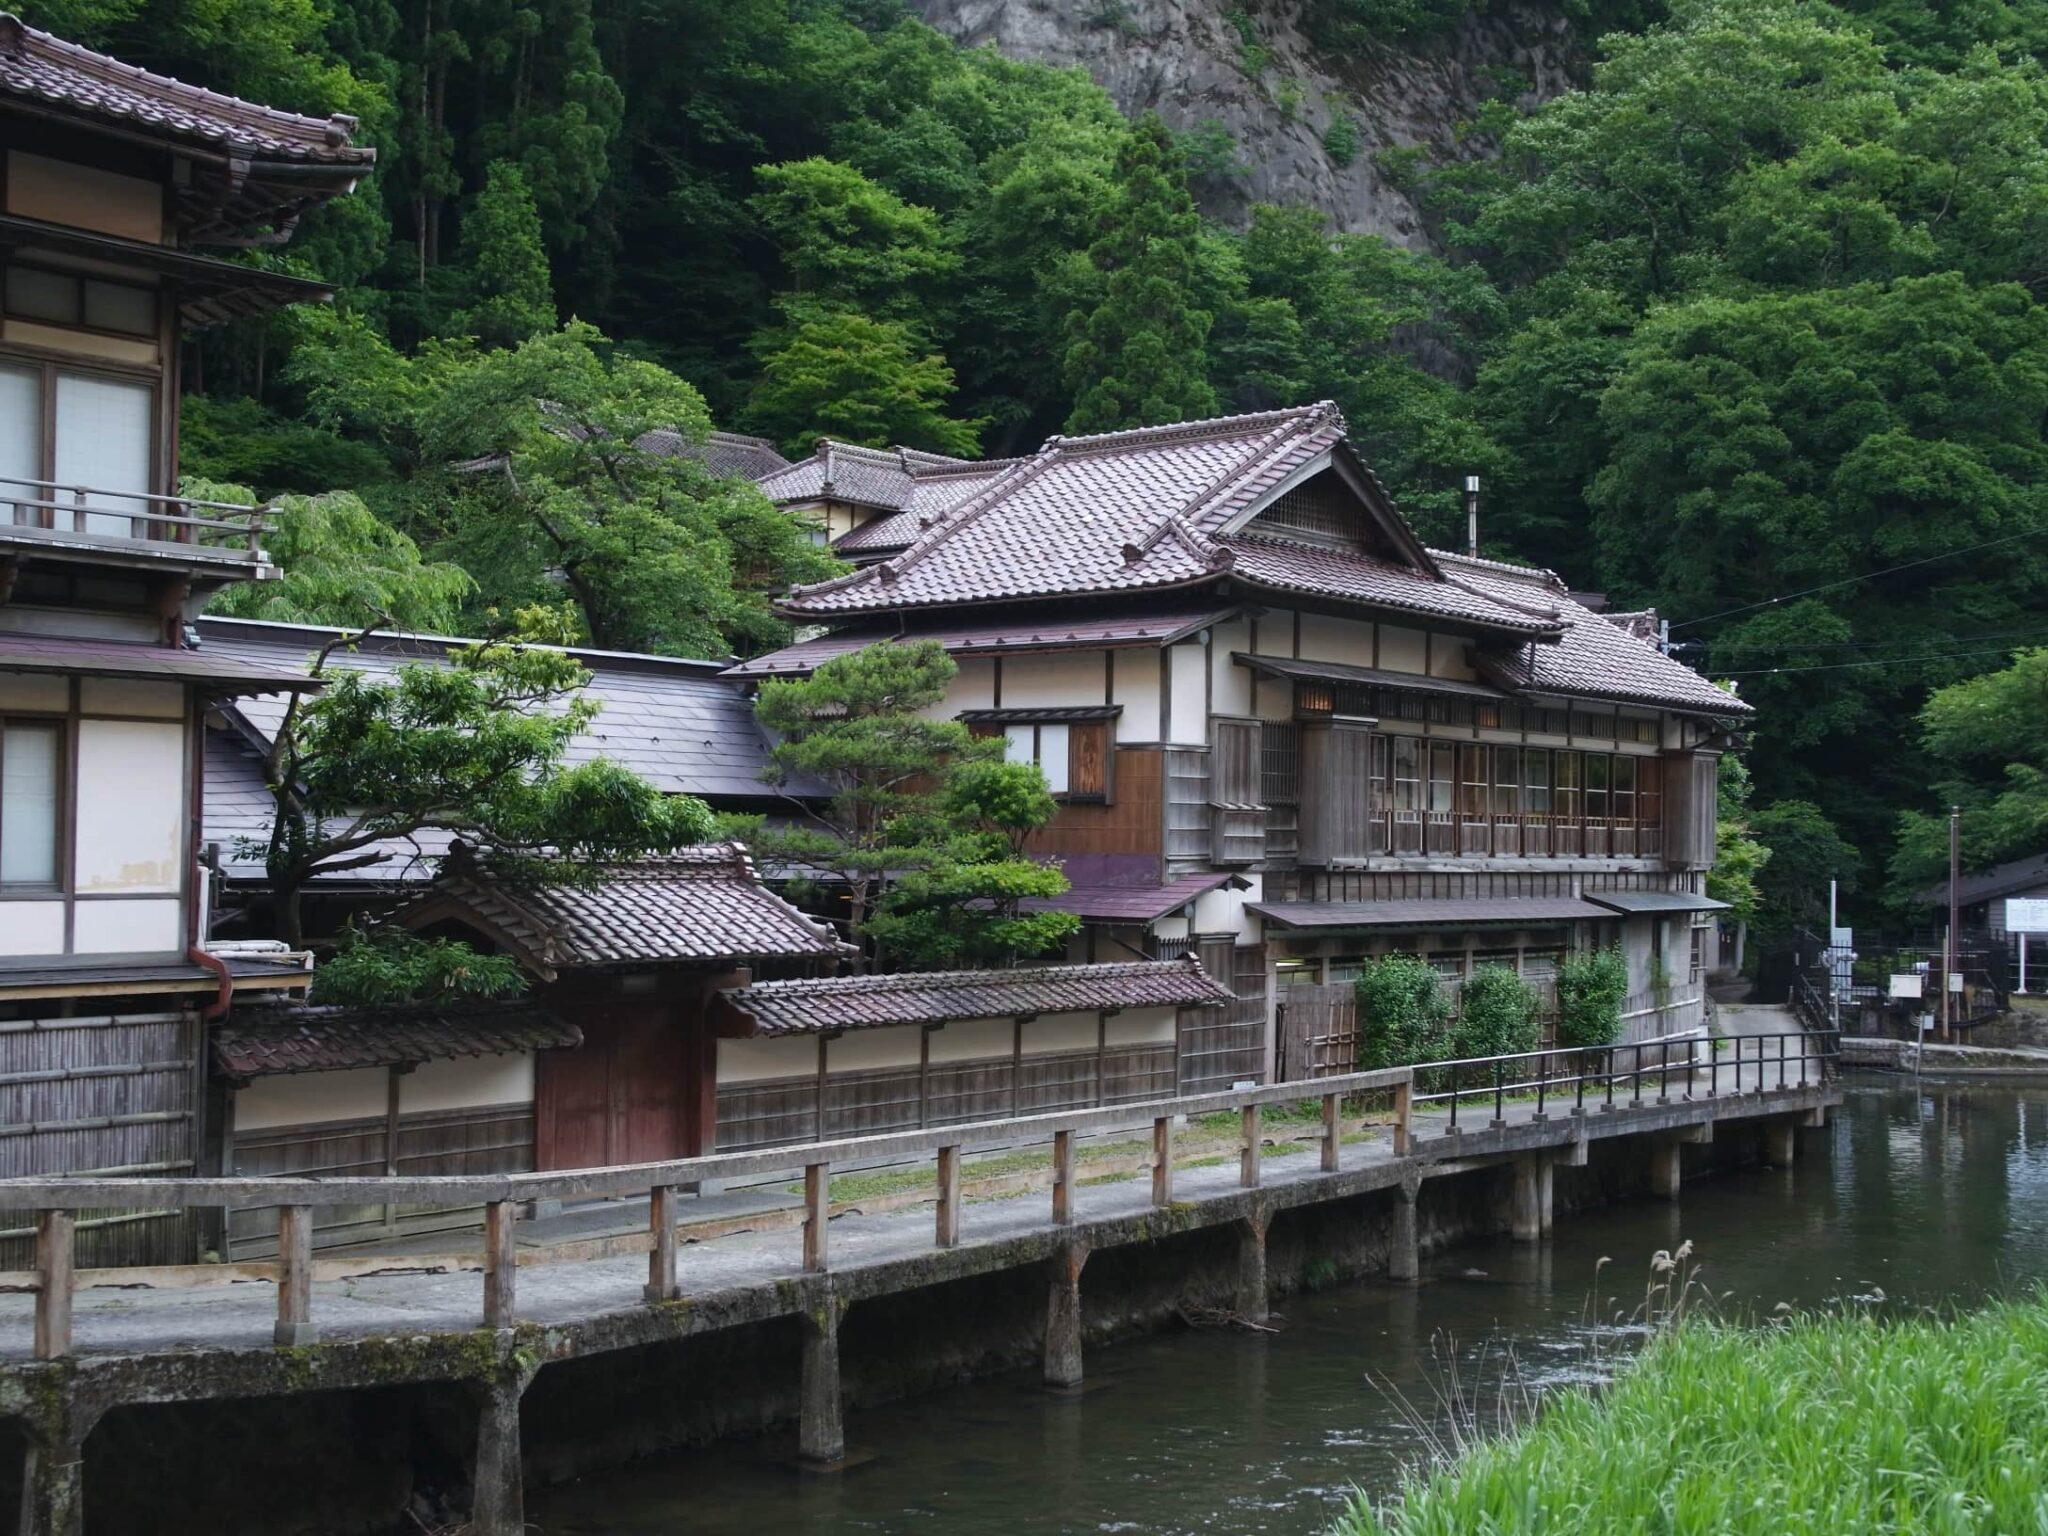 Mukaitaki-Higashiyama-Onsen-Aizu-Fukushima@0.5x-2048x1536.jpg